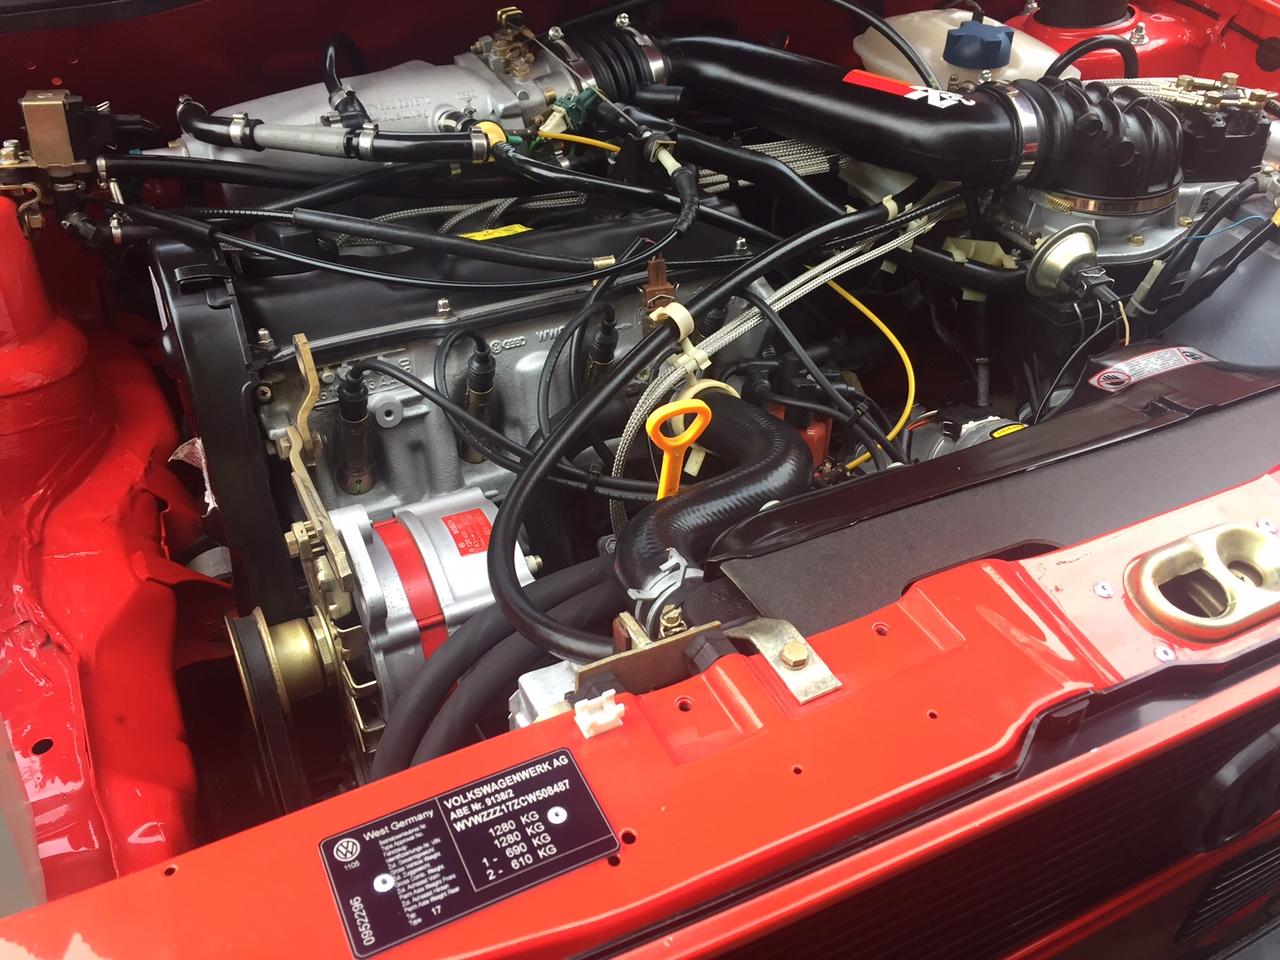 Mk1 Golf Reproduction VIN Plate